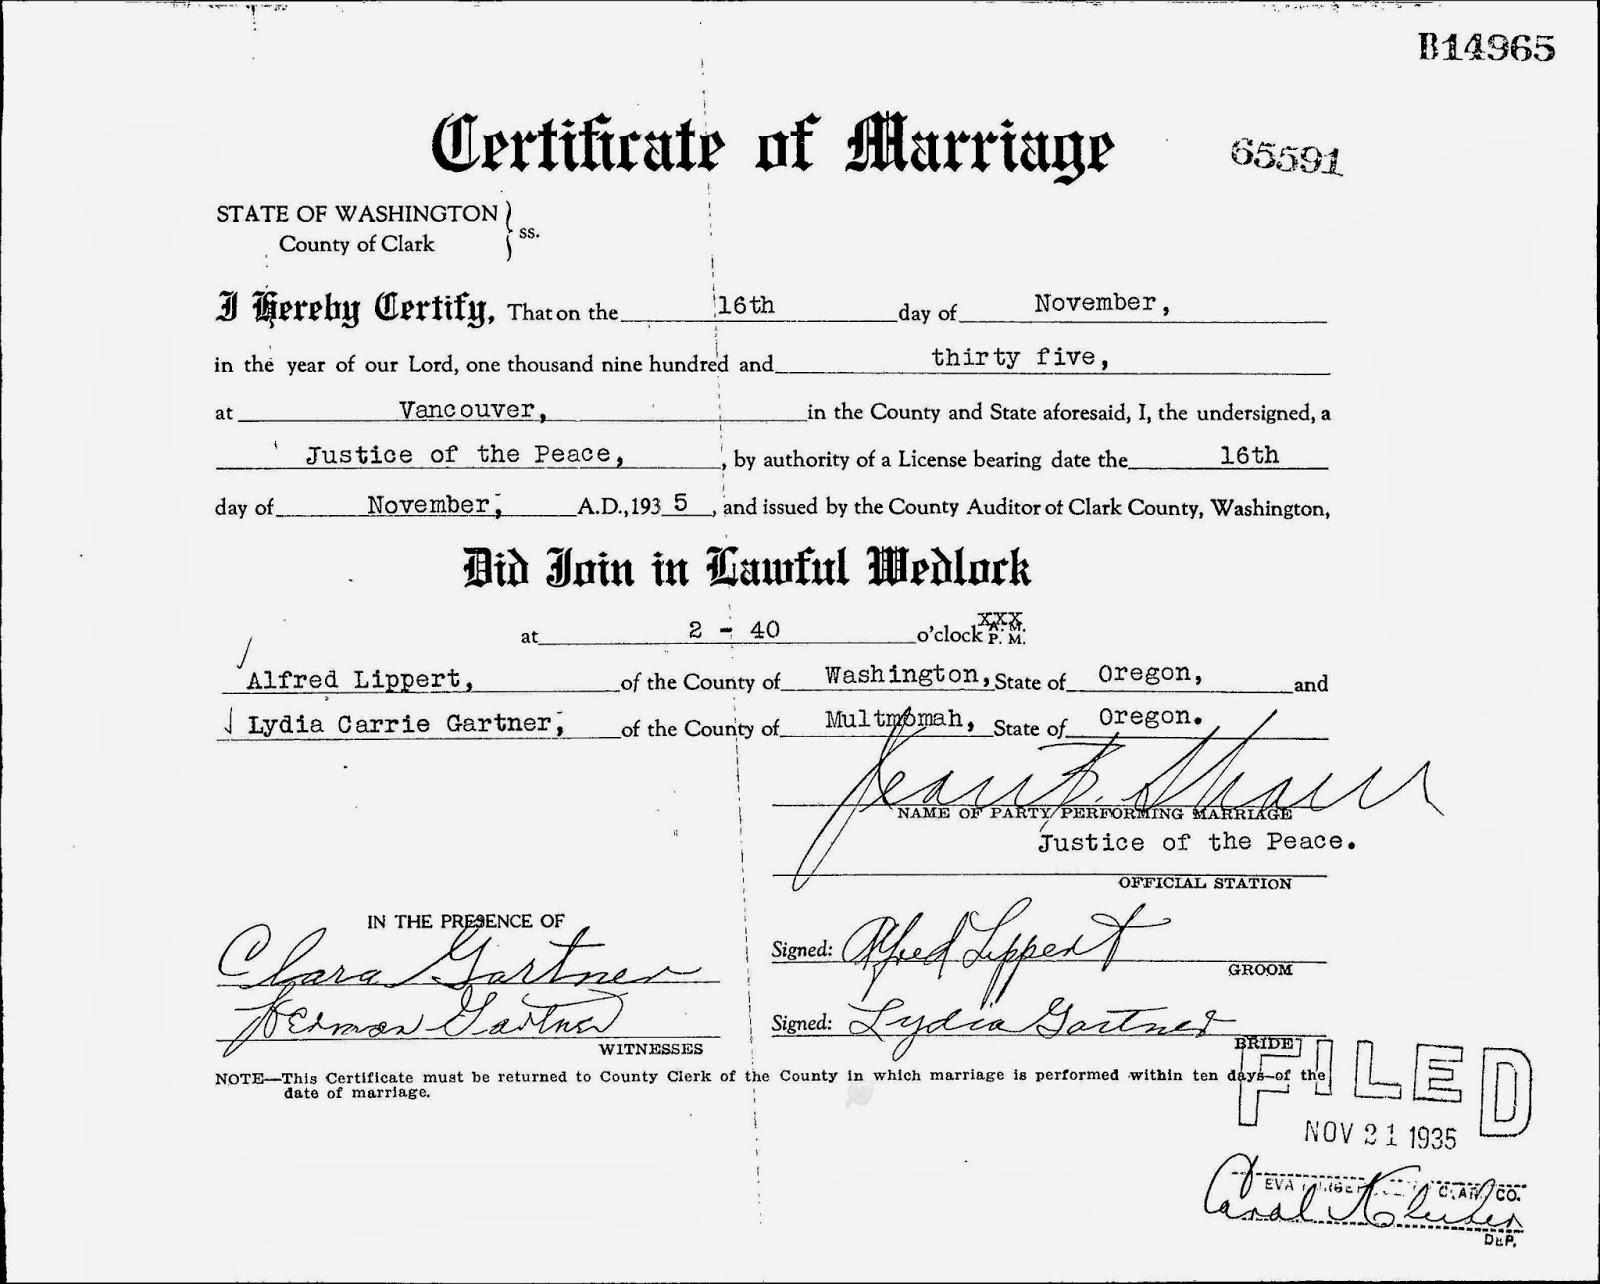 Millican carrara lippert et al genealogy blog lippert weddings